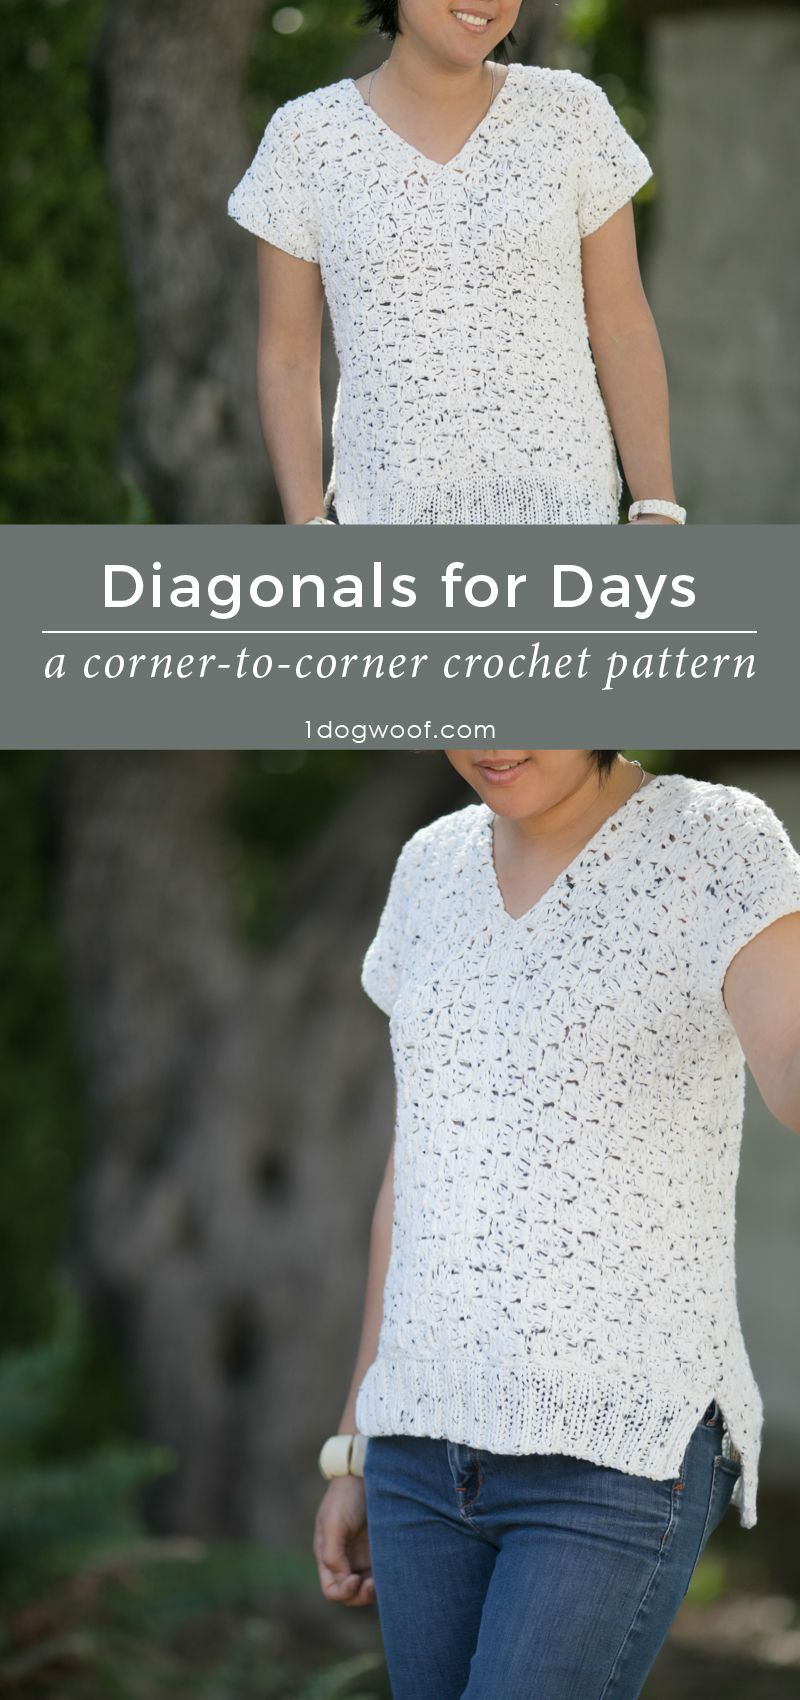 Diagonals for Days C2C Crochet Top | Pinterest | Free pattern ...